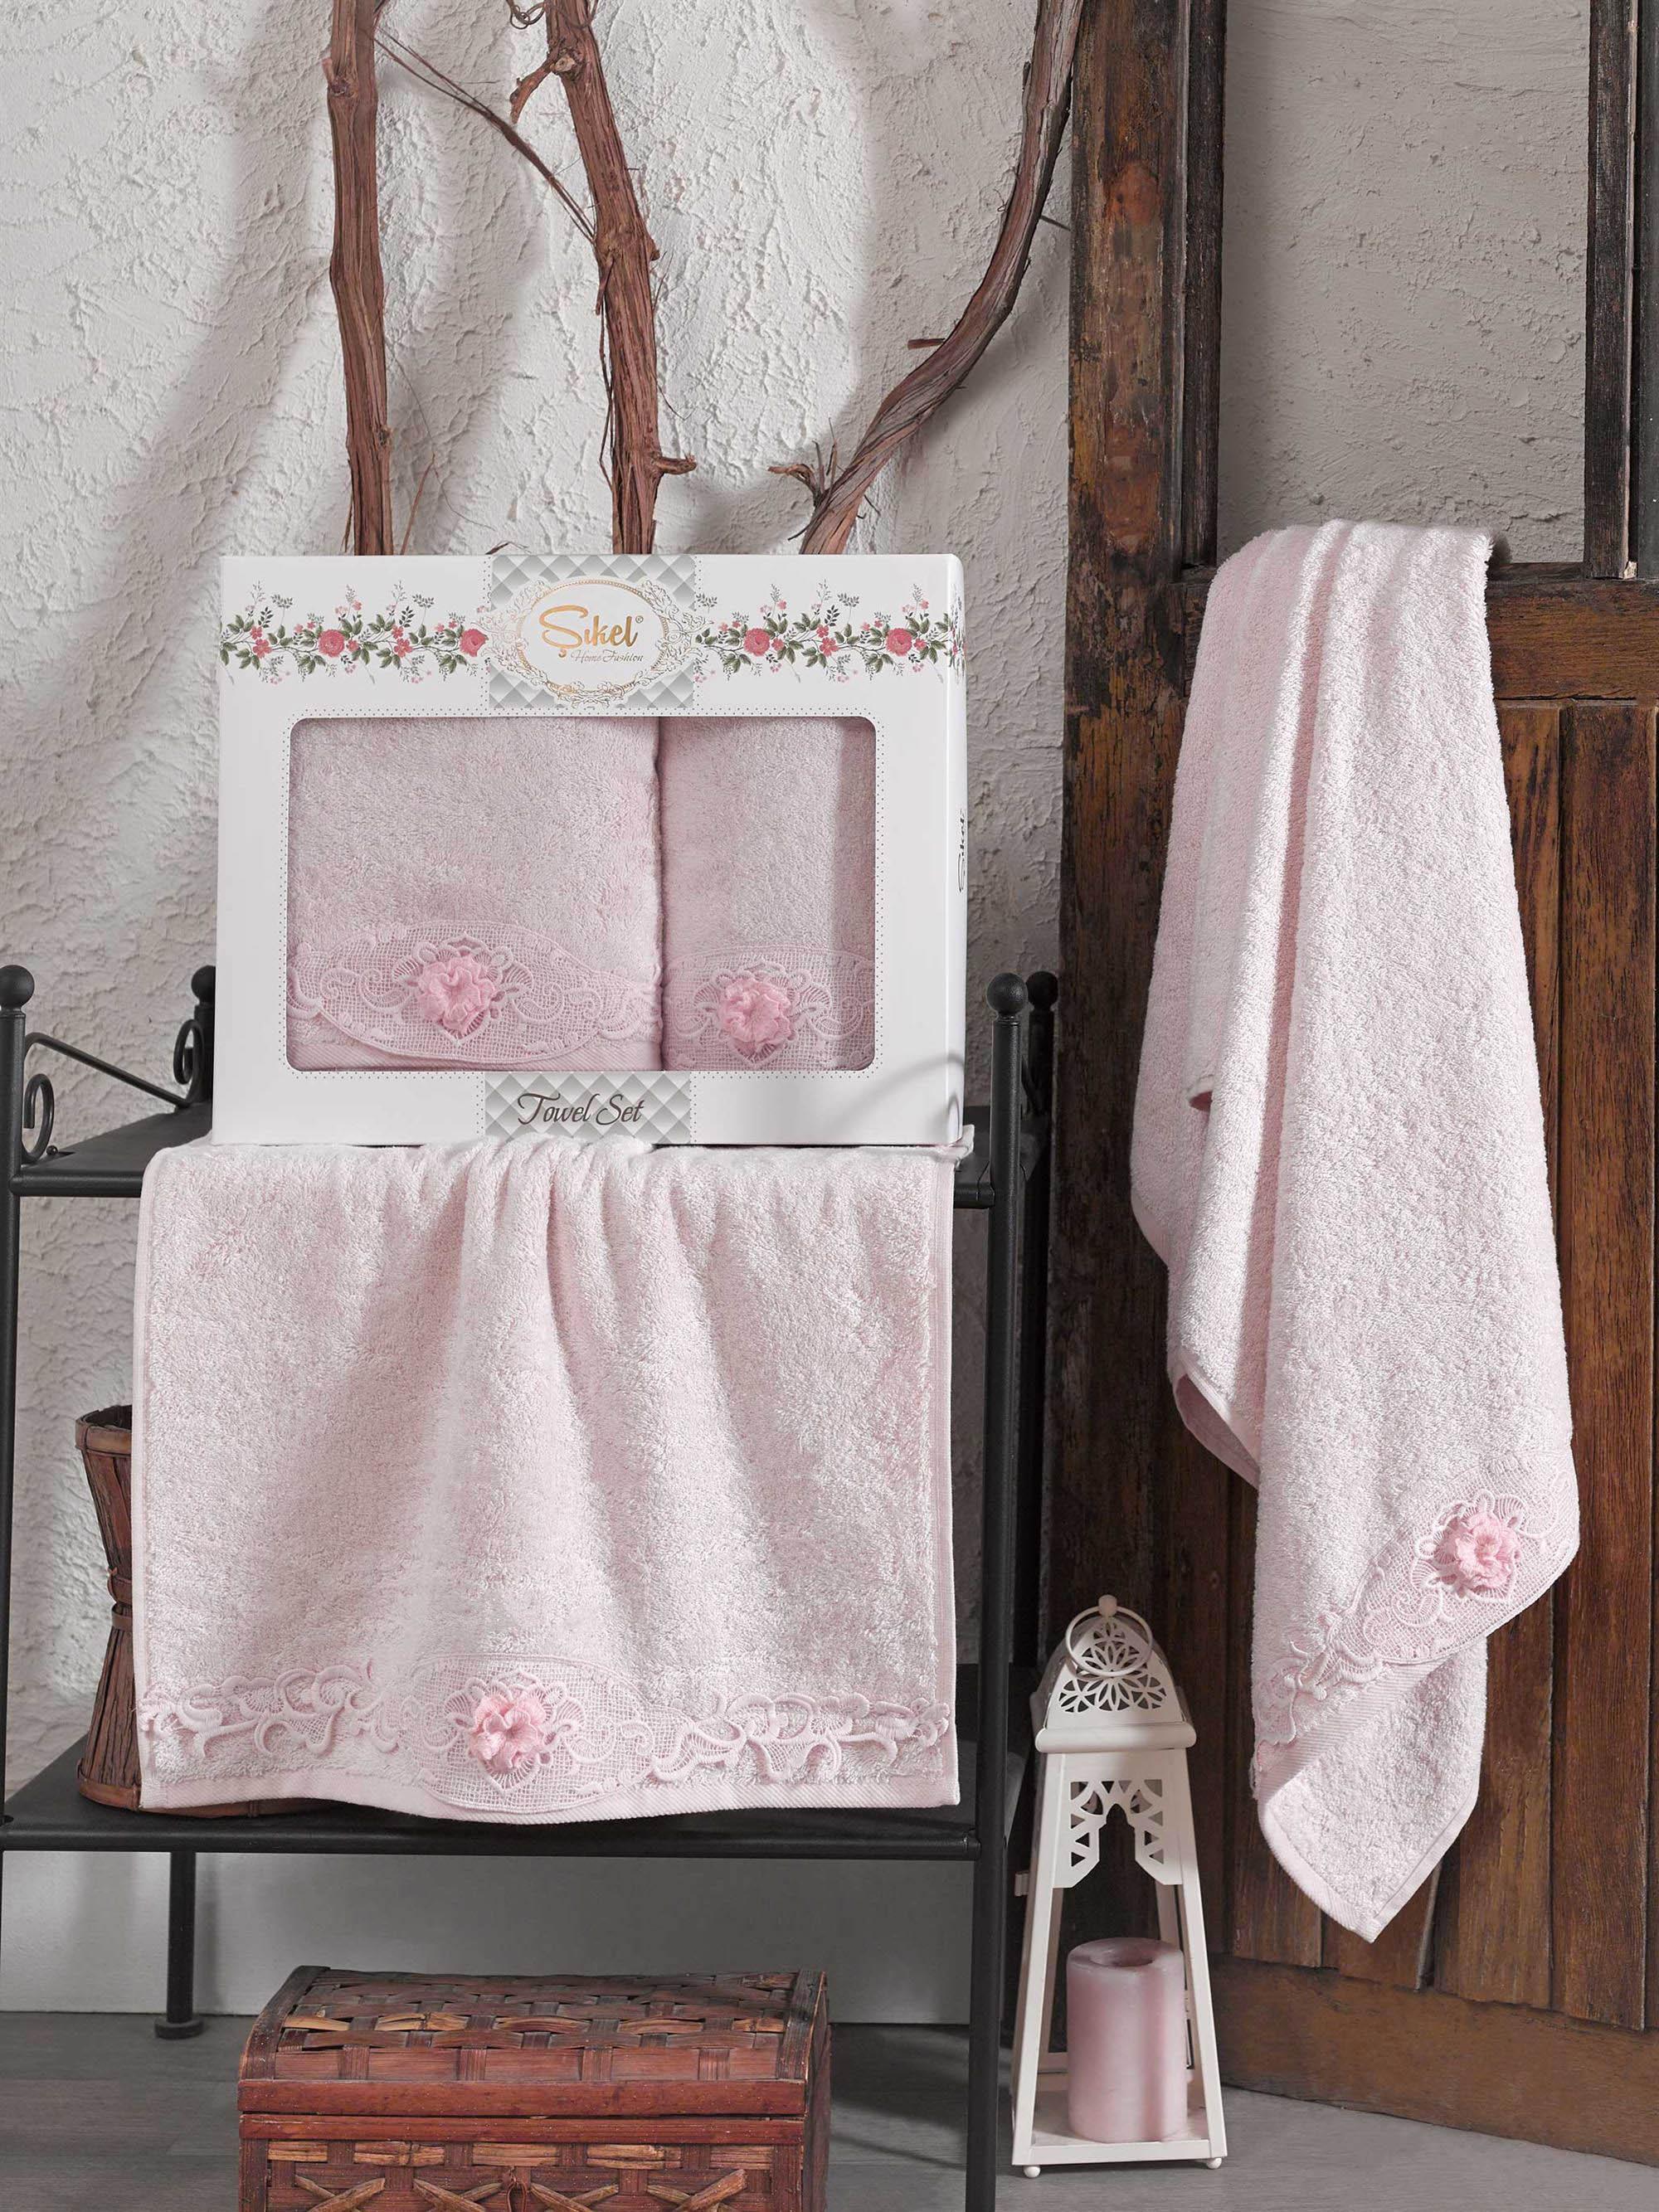 Полотенца Sikel Полотенце Afrodit Цвет: Розовый (50х90 см,70х140 см) sikel набор из 2 полотенец nazande цвет коричневый